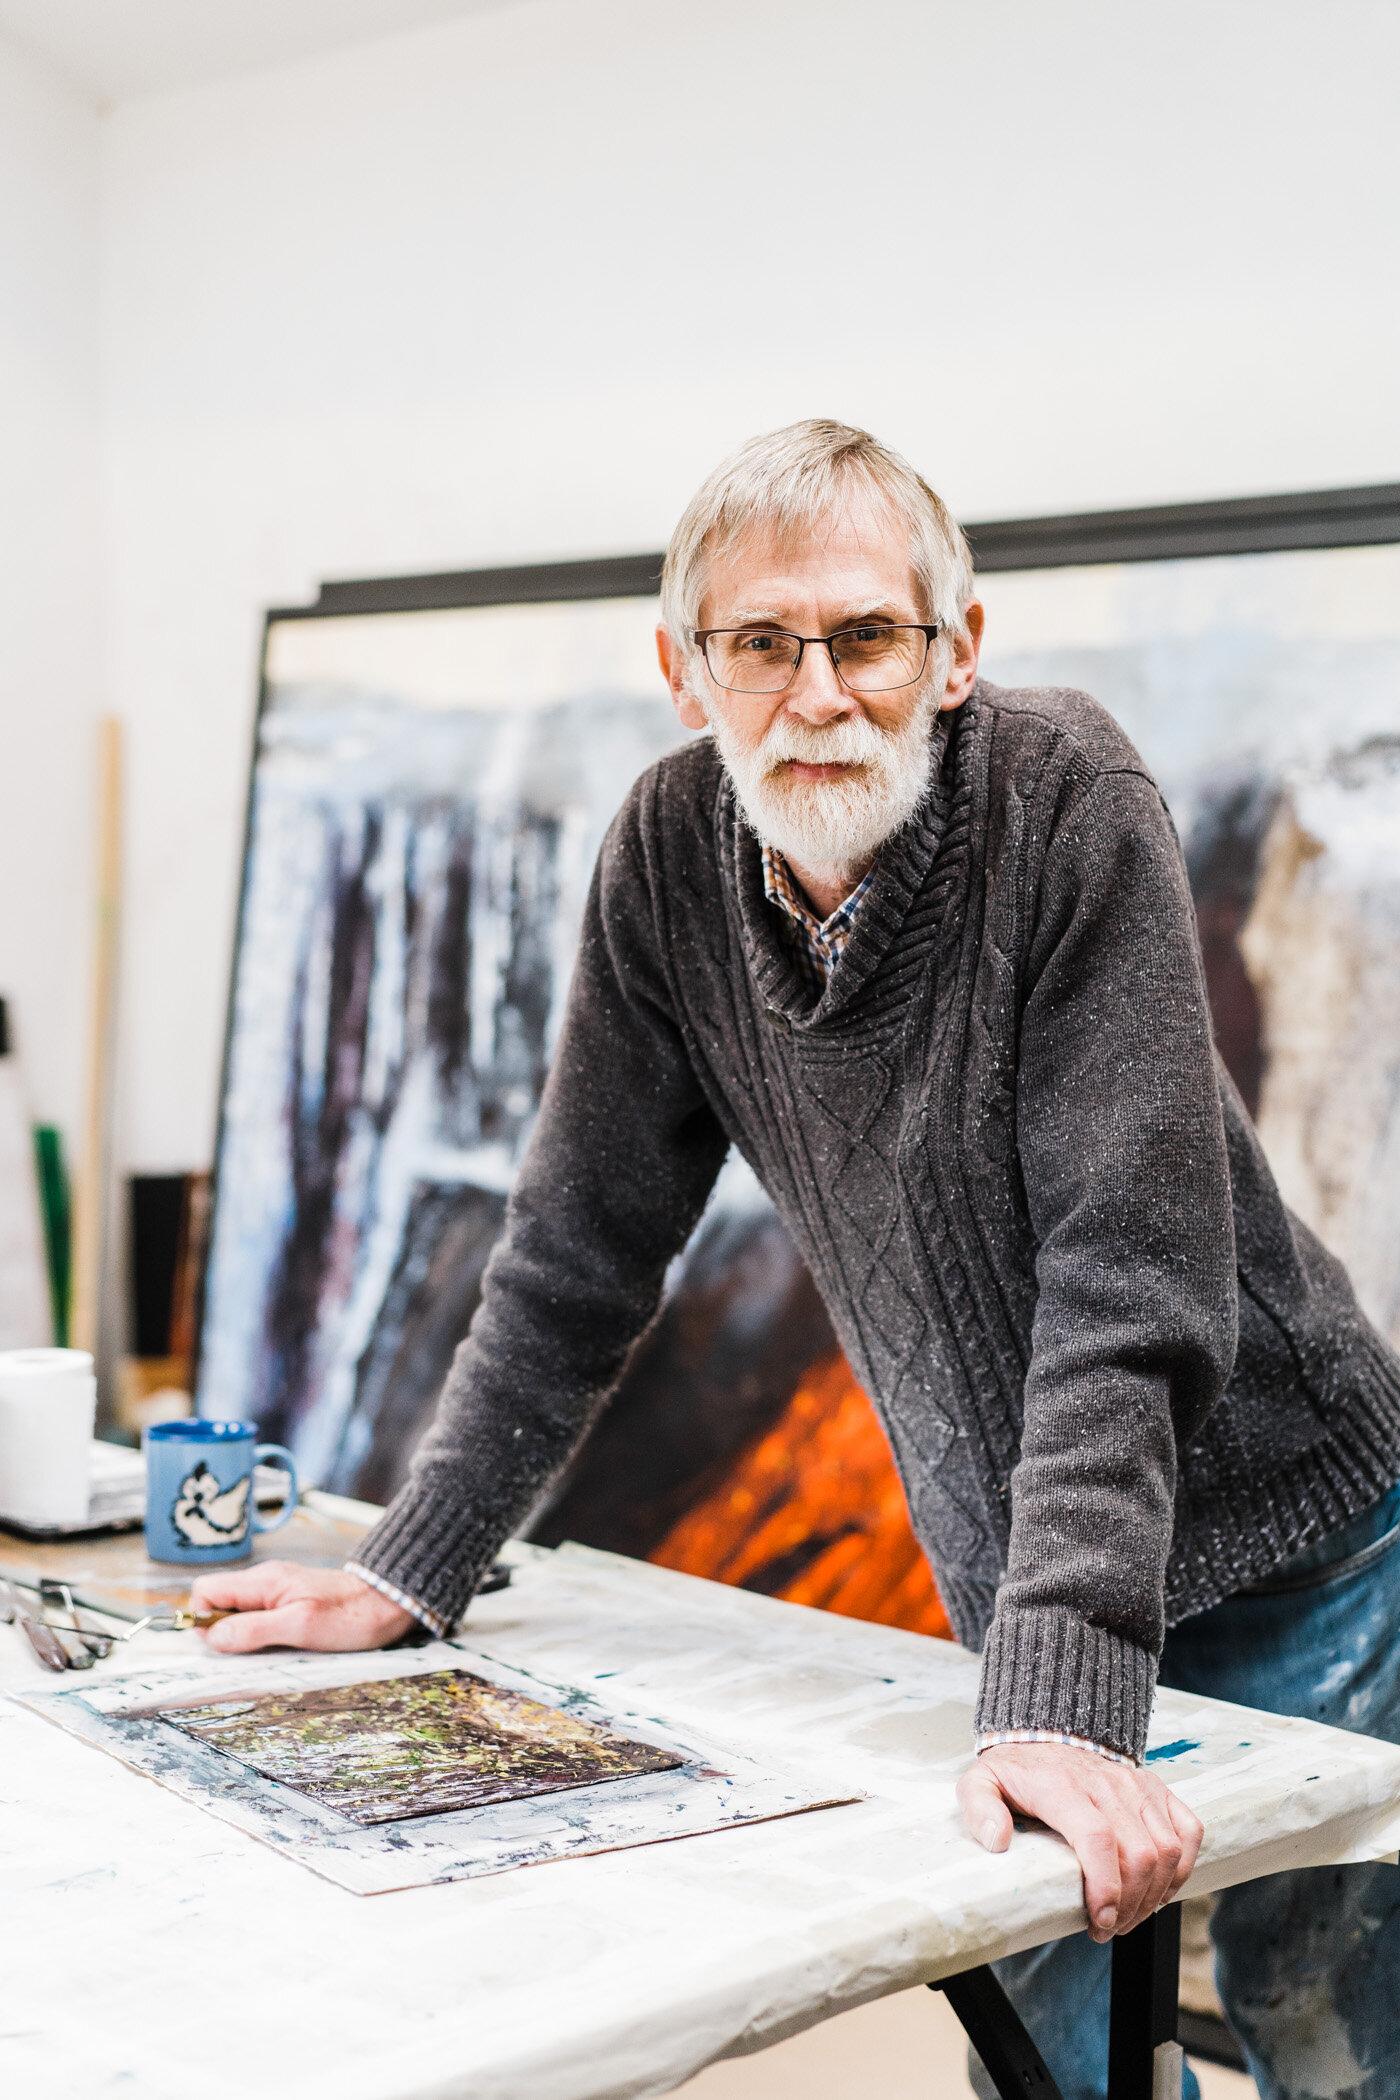 Northern Irish painter artist Maurice Orr in his studio